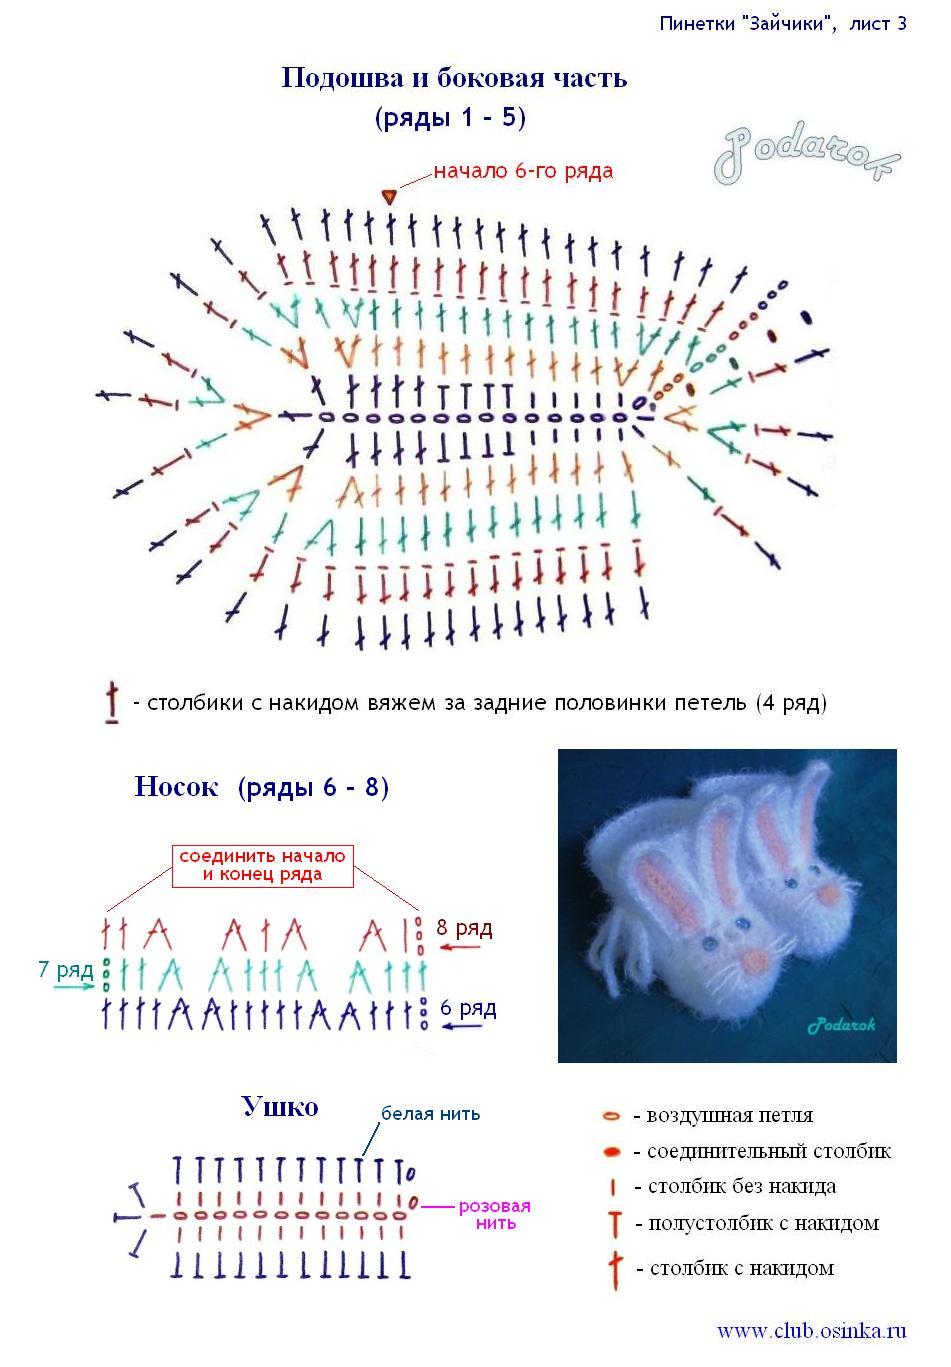 Пинетки крючком: схемы, идеи - схема пинеток 23